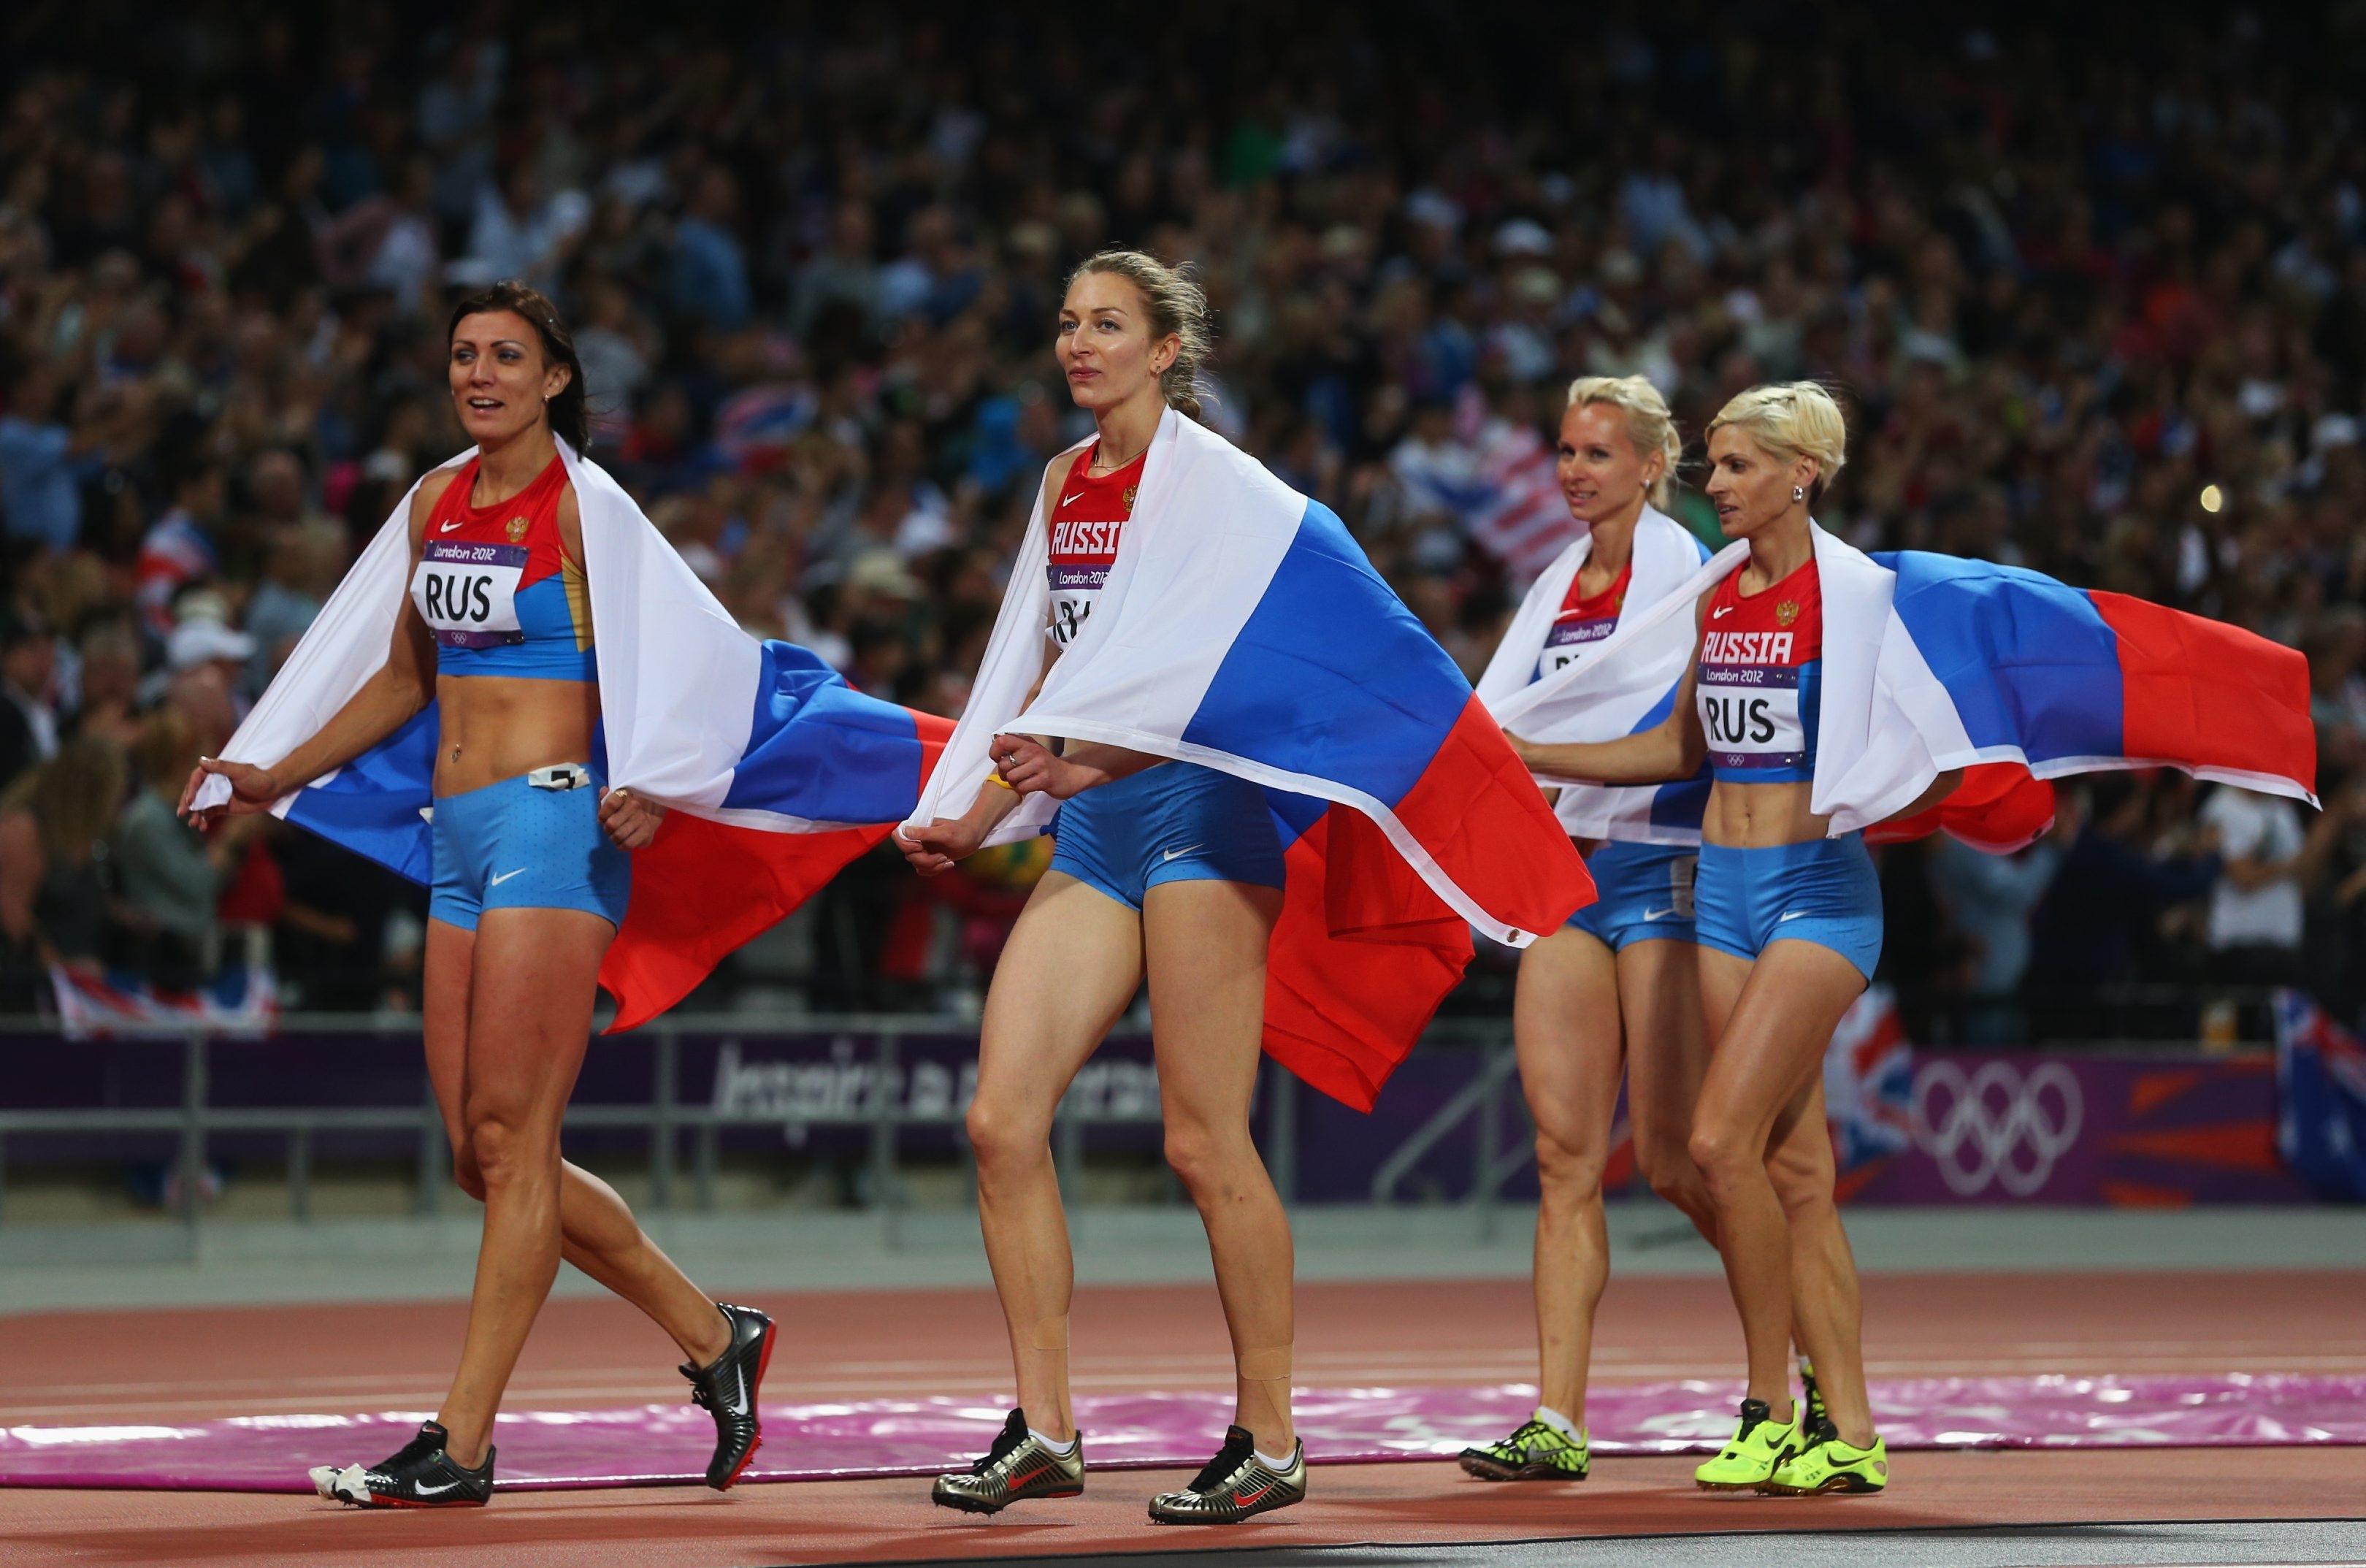 Natalya Antyukh, Tatyana Firova, Yulia Gushchina and Antonina Krivoshapka of Russia celebrate winning silver in the Women's 4x400 Relay Final at the London Olympics.